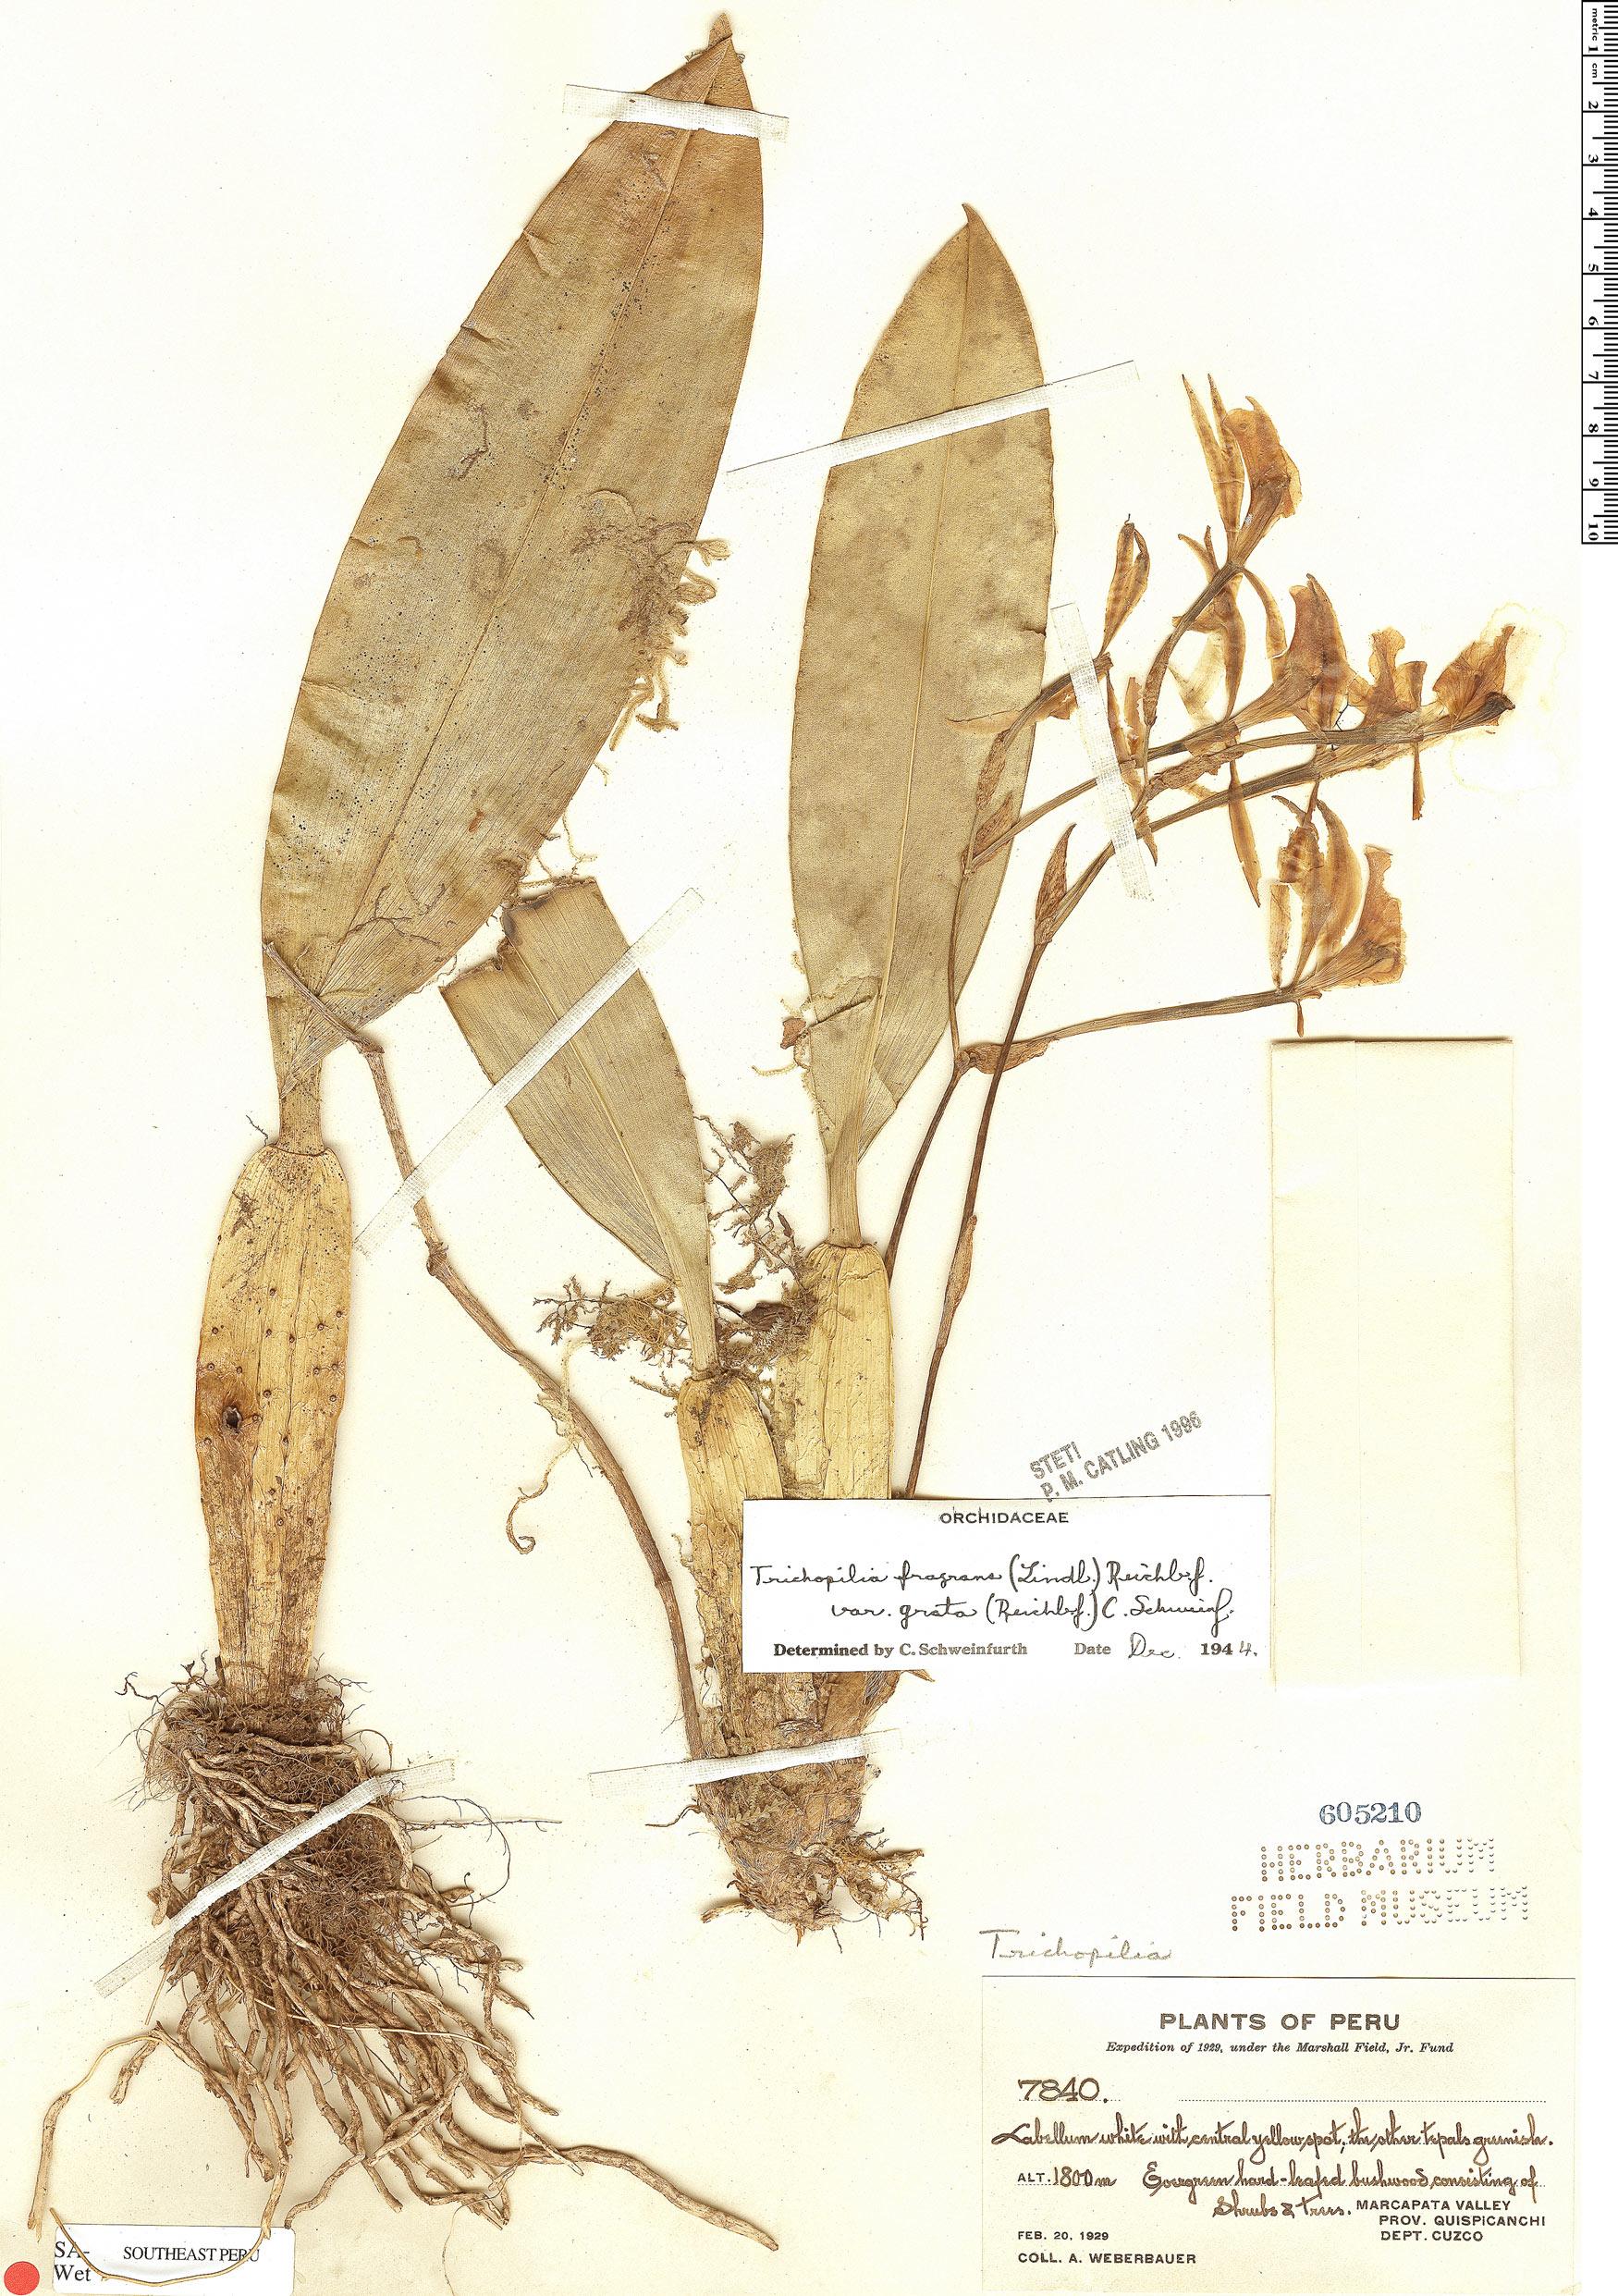 Specimen: Trichopilia fragrans